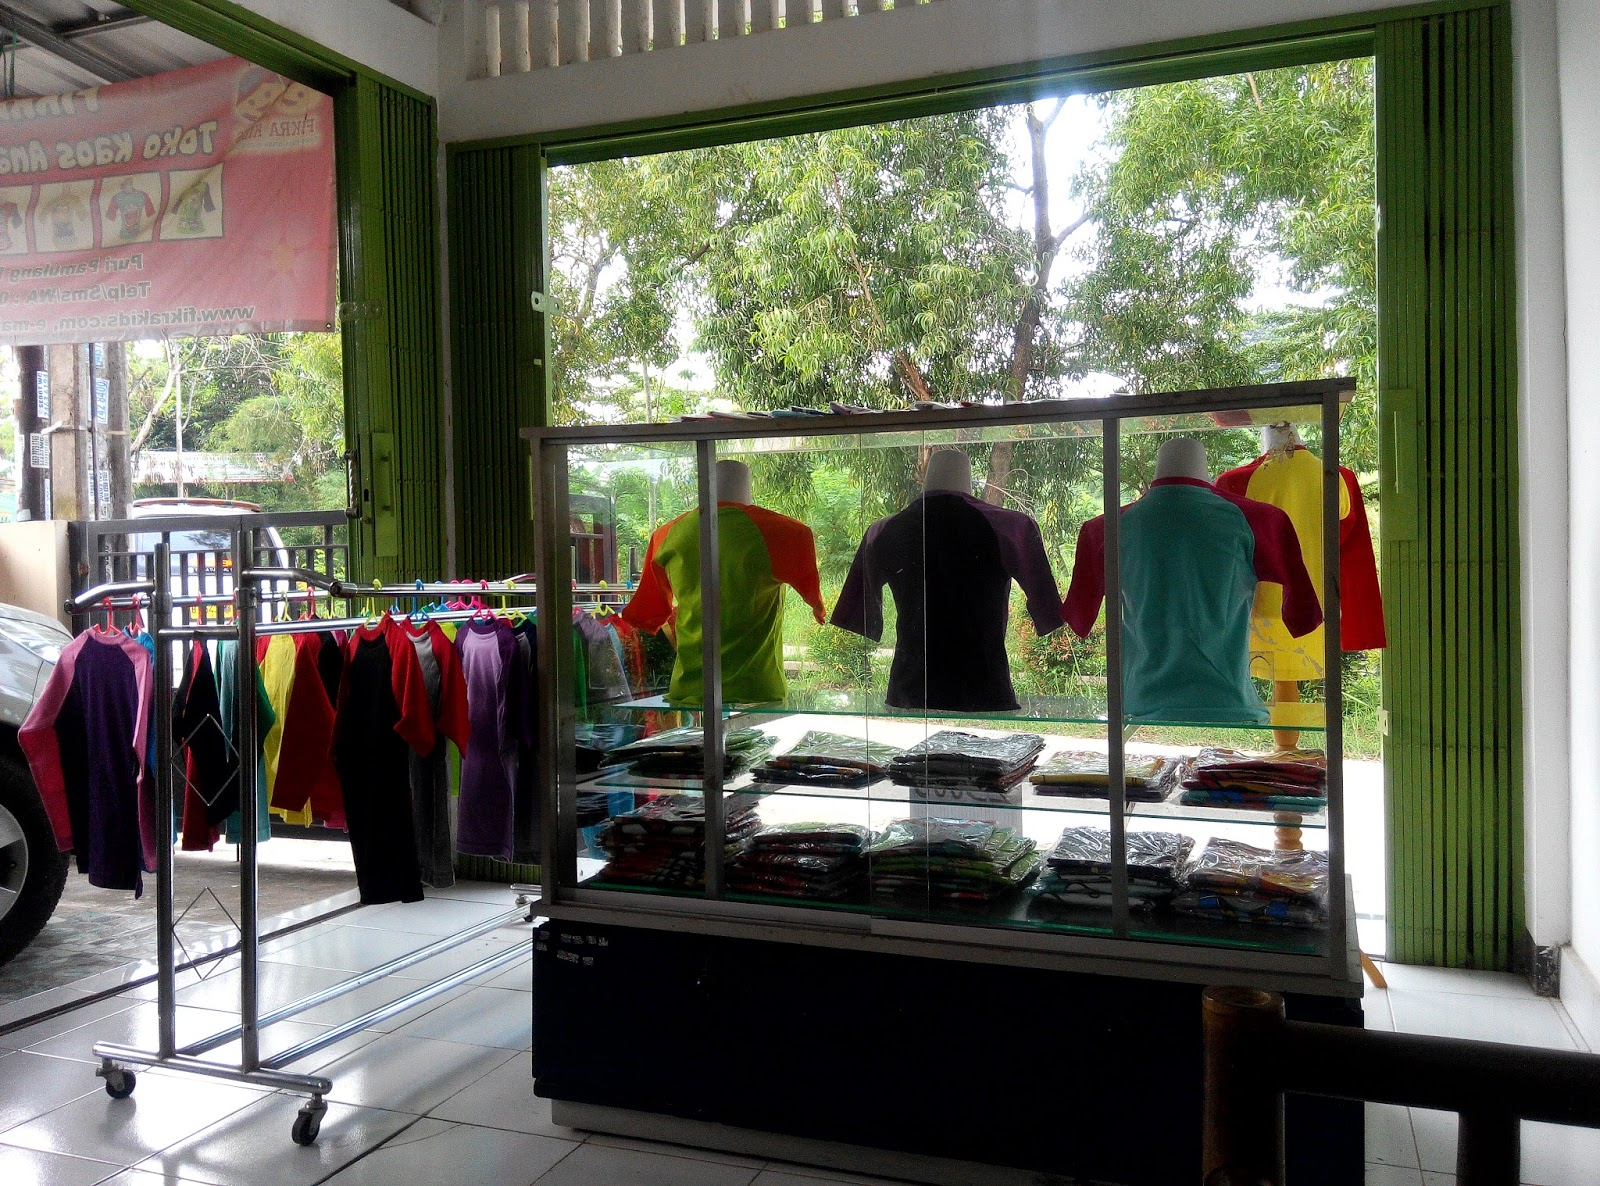 Teka Teki Kehidupan Dari Bisnis ATK Ke Bisnis Kaos Raglan Anak